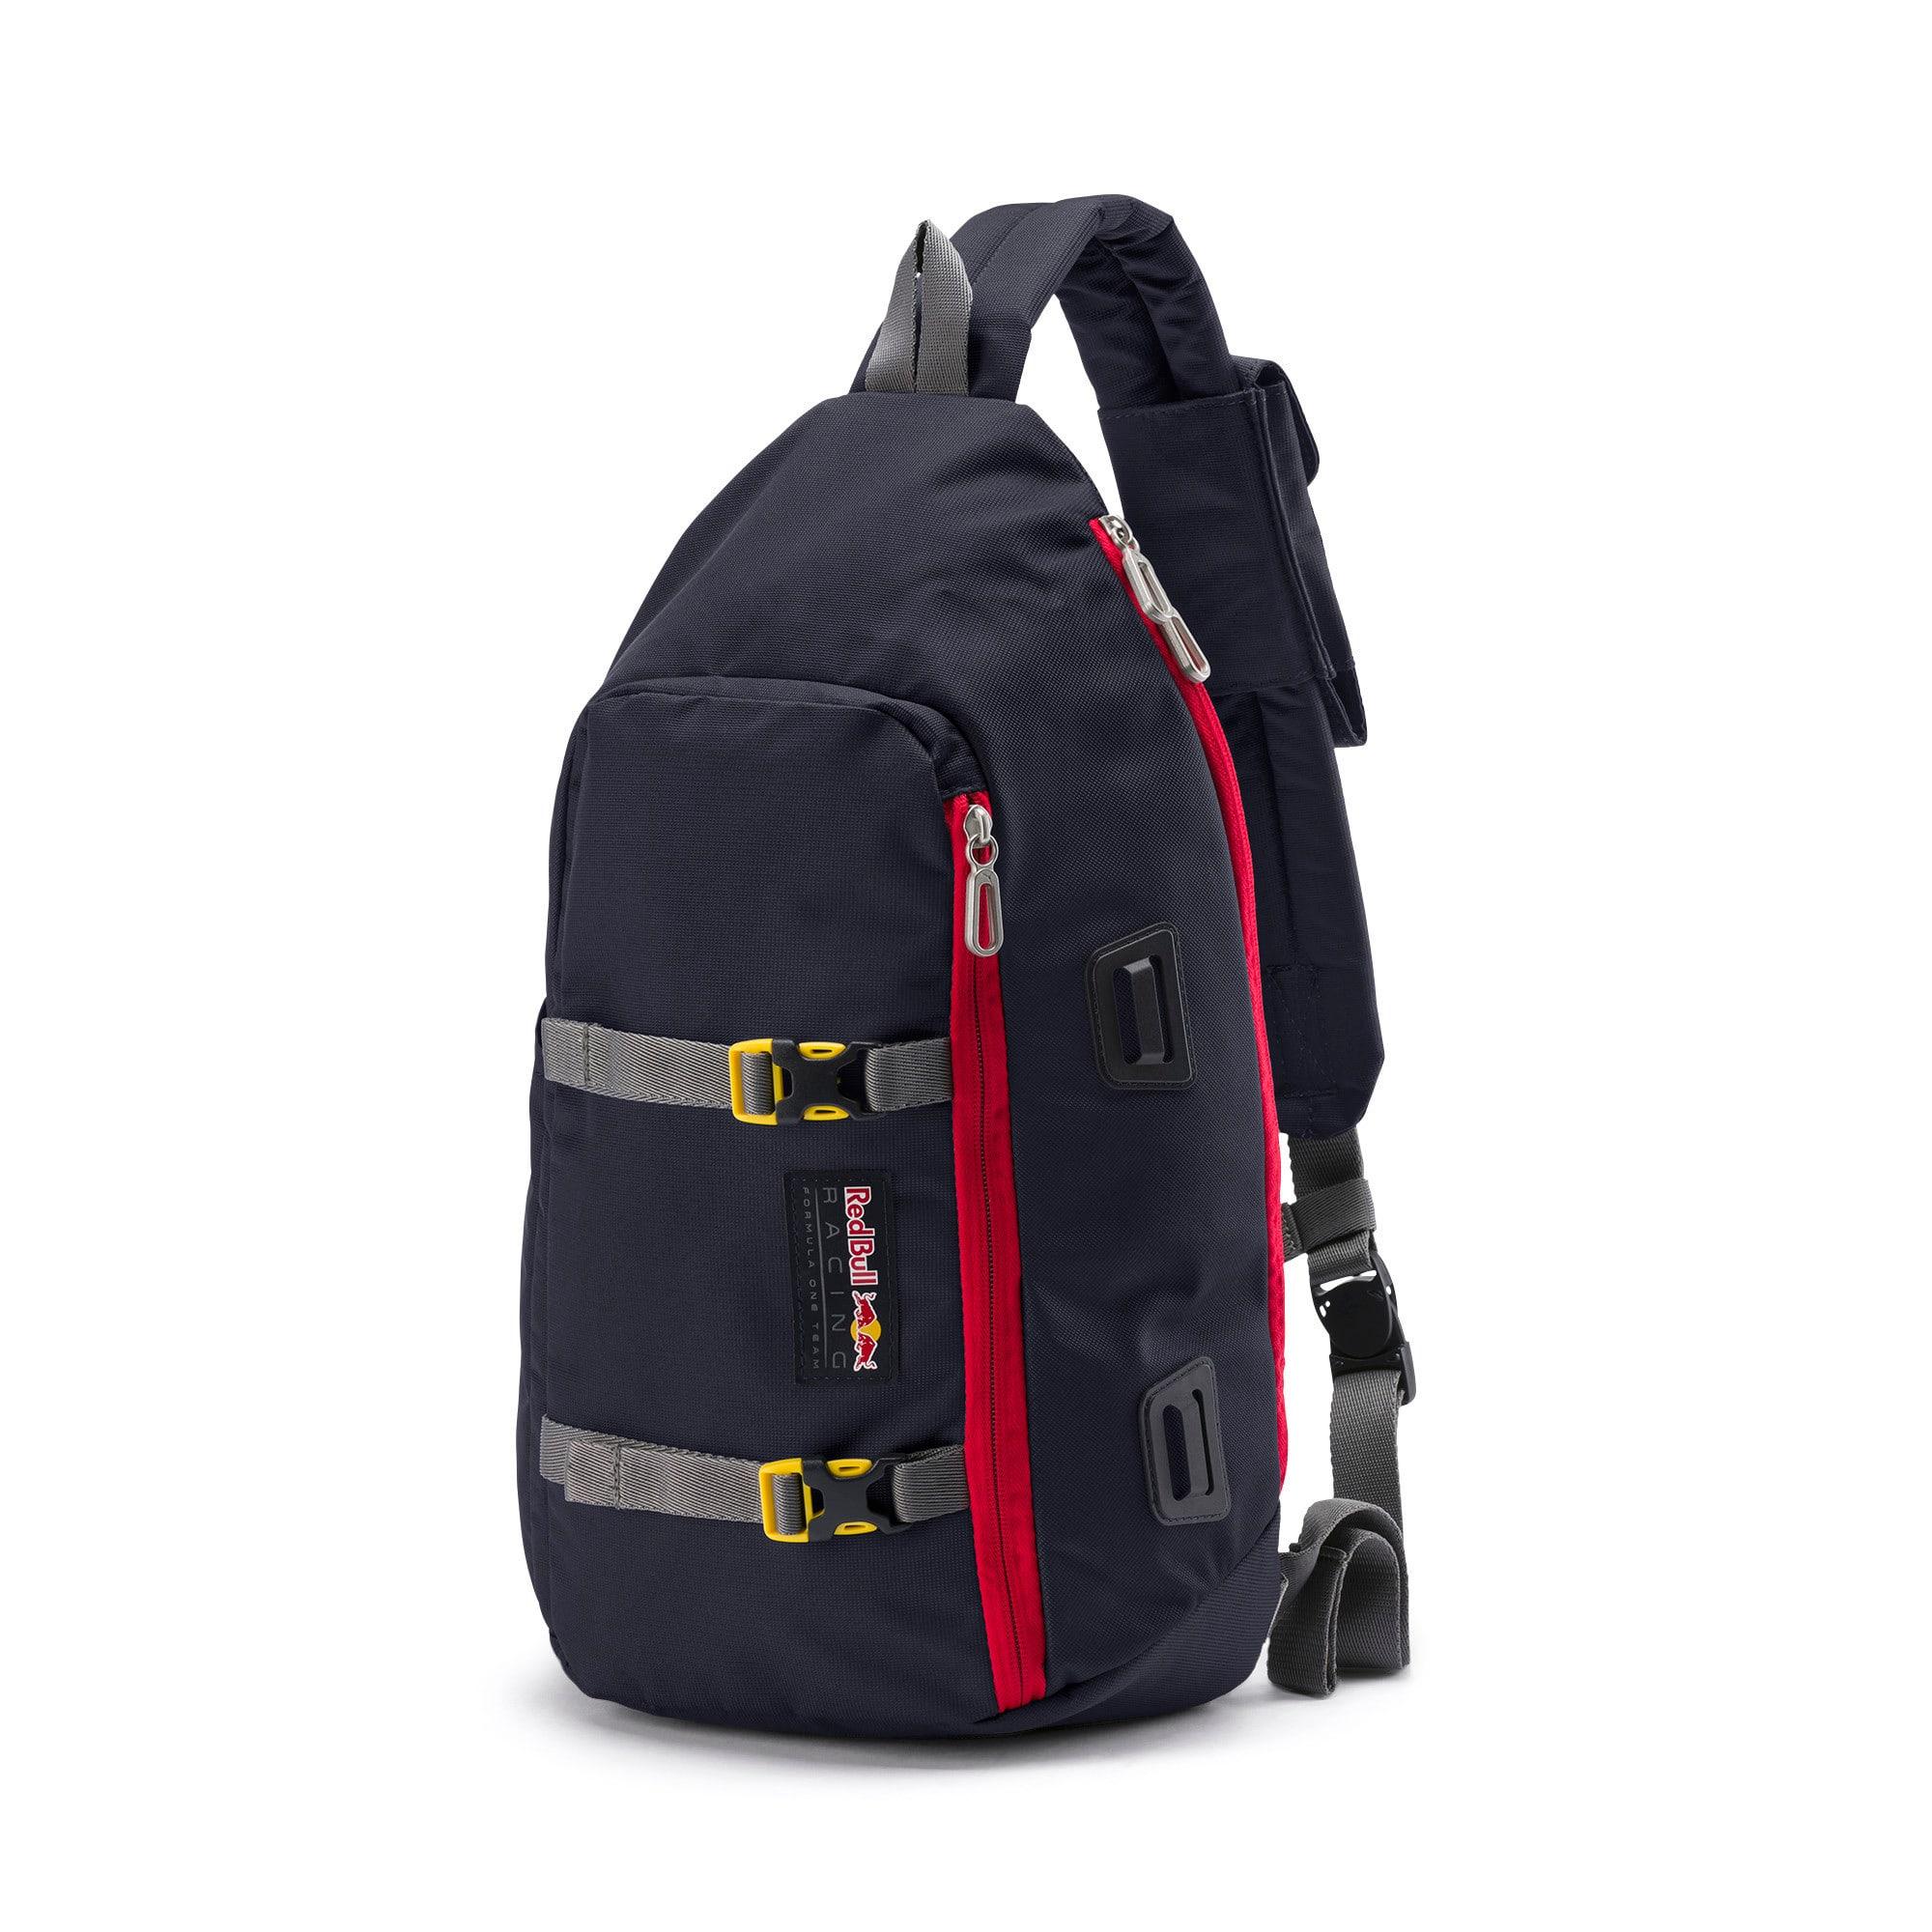 Thumbnail 1 of PUMA x RBR Lifestyle Sling Shoulder Bag, NIGHT SKY, medium